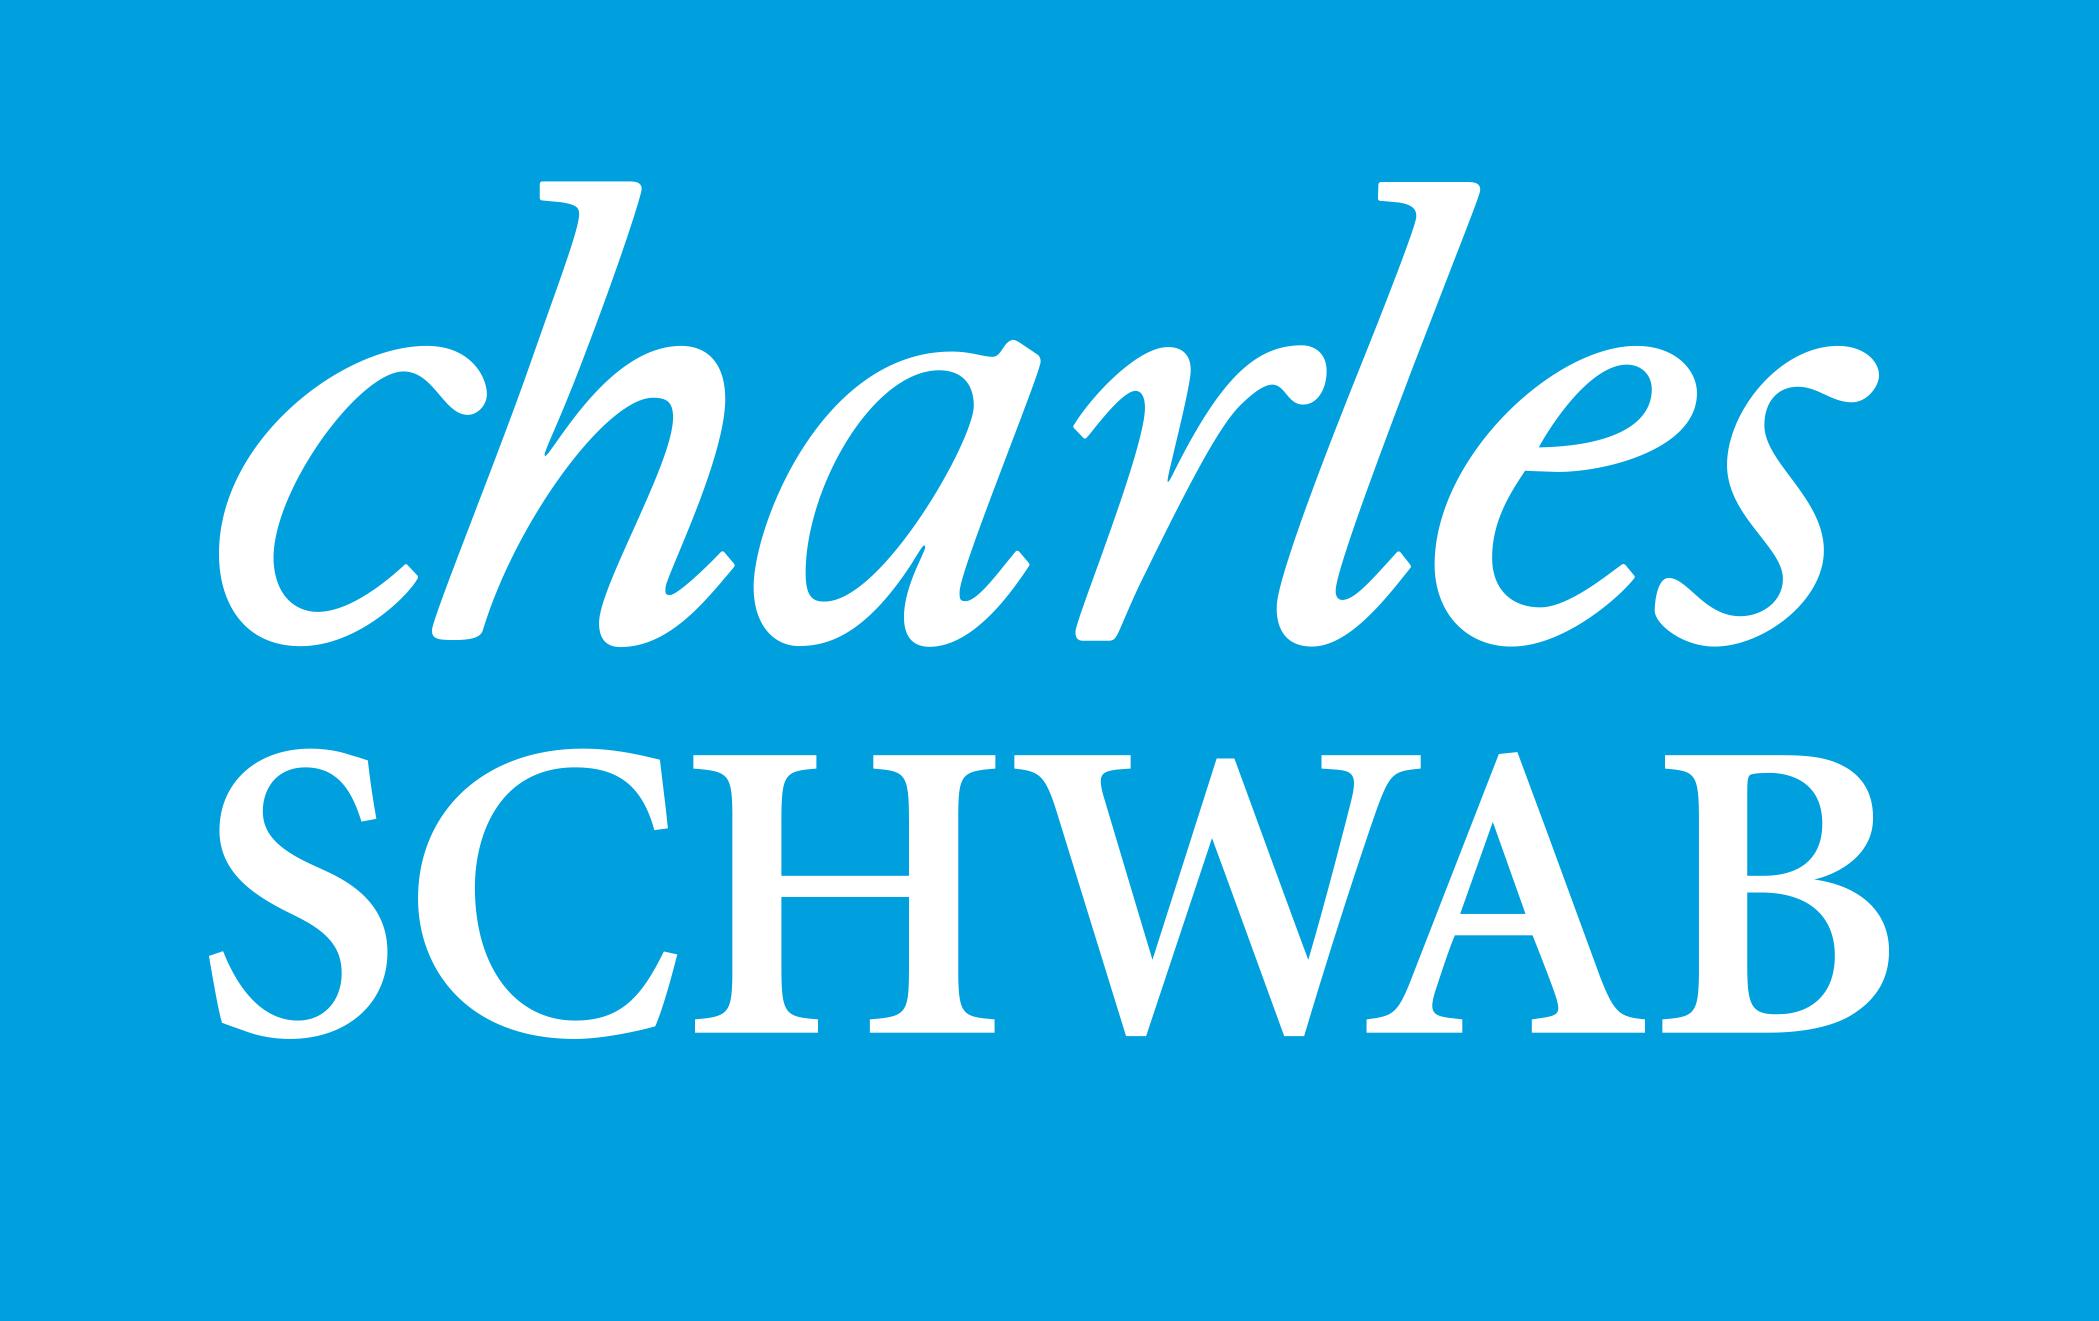 Charles Schwab logo in white lettering on blue background.